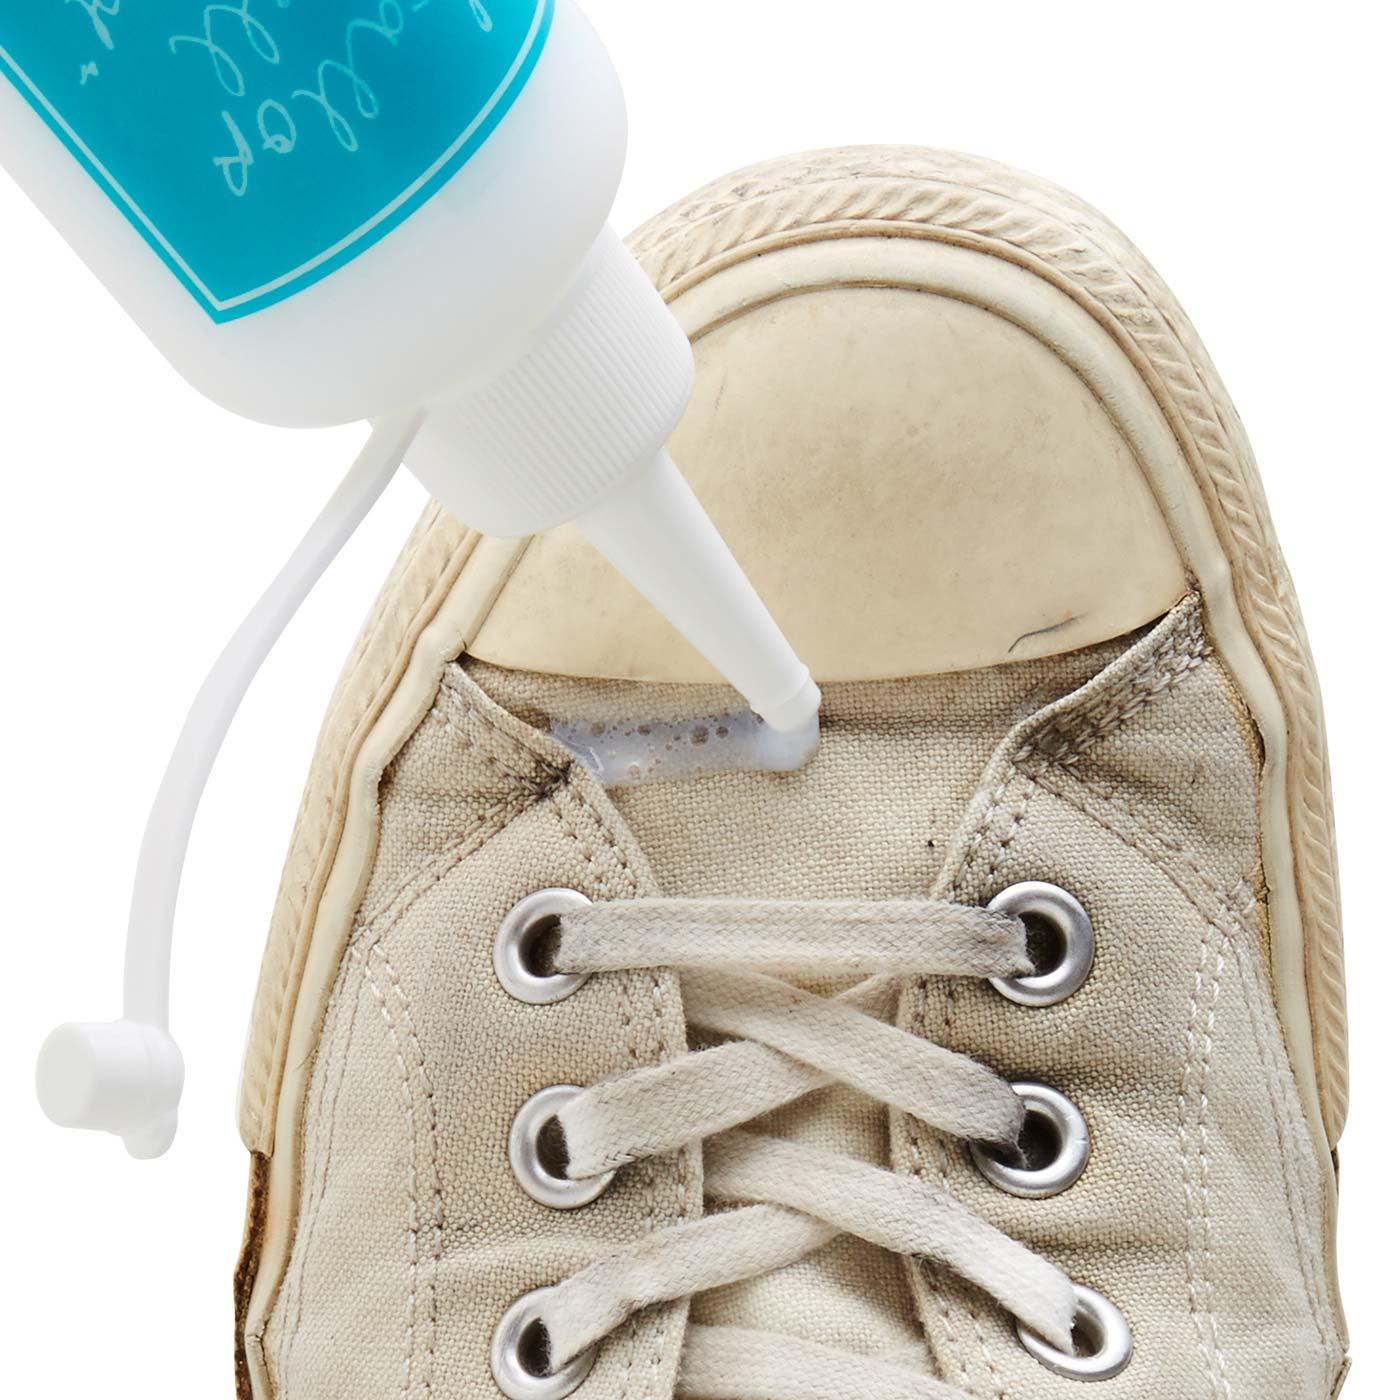 STEP 1 靴を水でぬらし、汚れ部分にクリーナーを塗ります。細いノズルだから細かな部分にも塗りやすい。